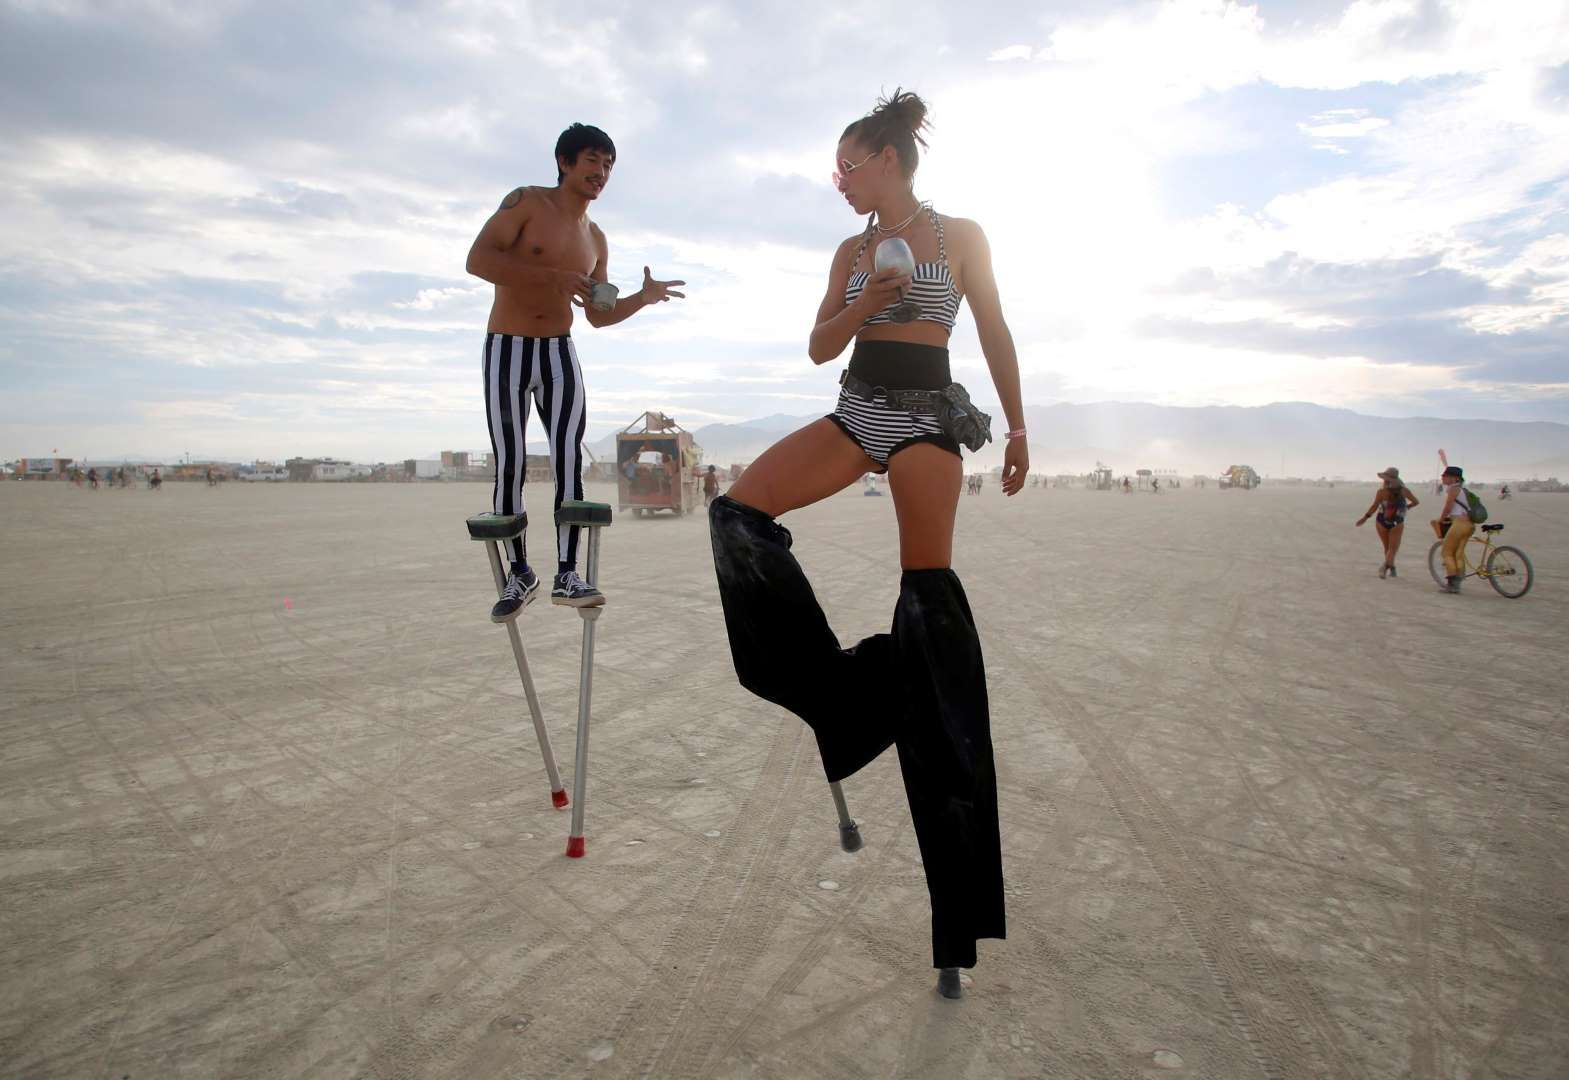 Divine Mustache (L) and Katapult Sandra, their Playa names, dance on stilts on Aug. 29.